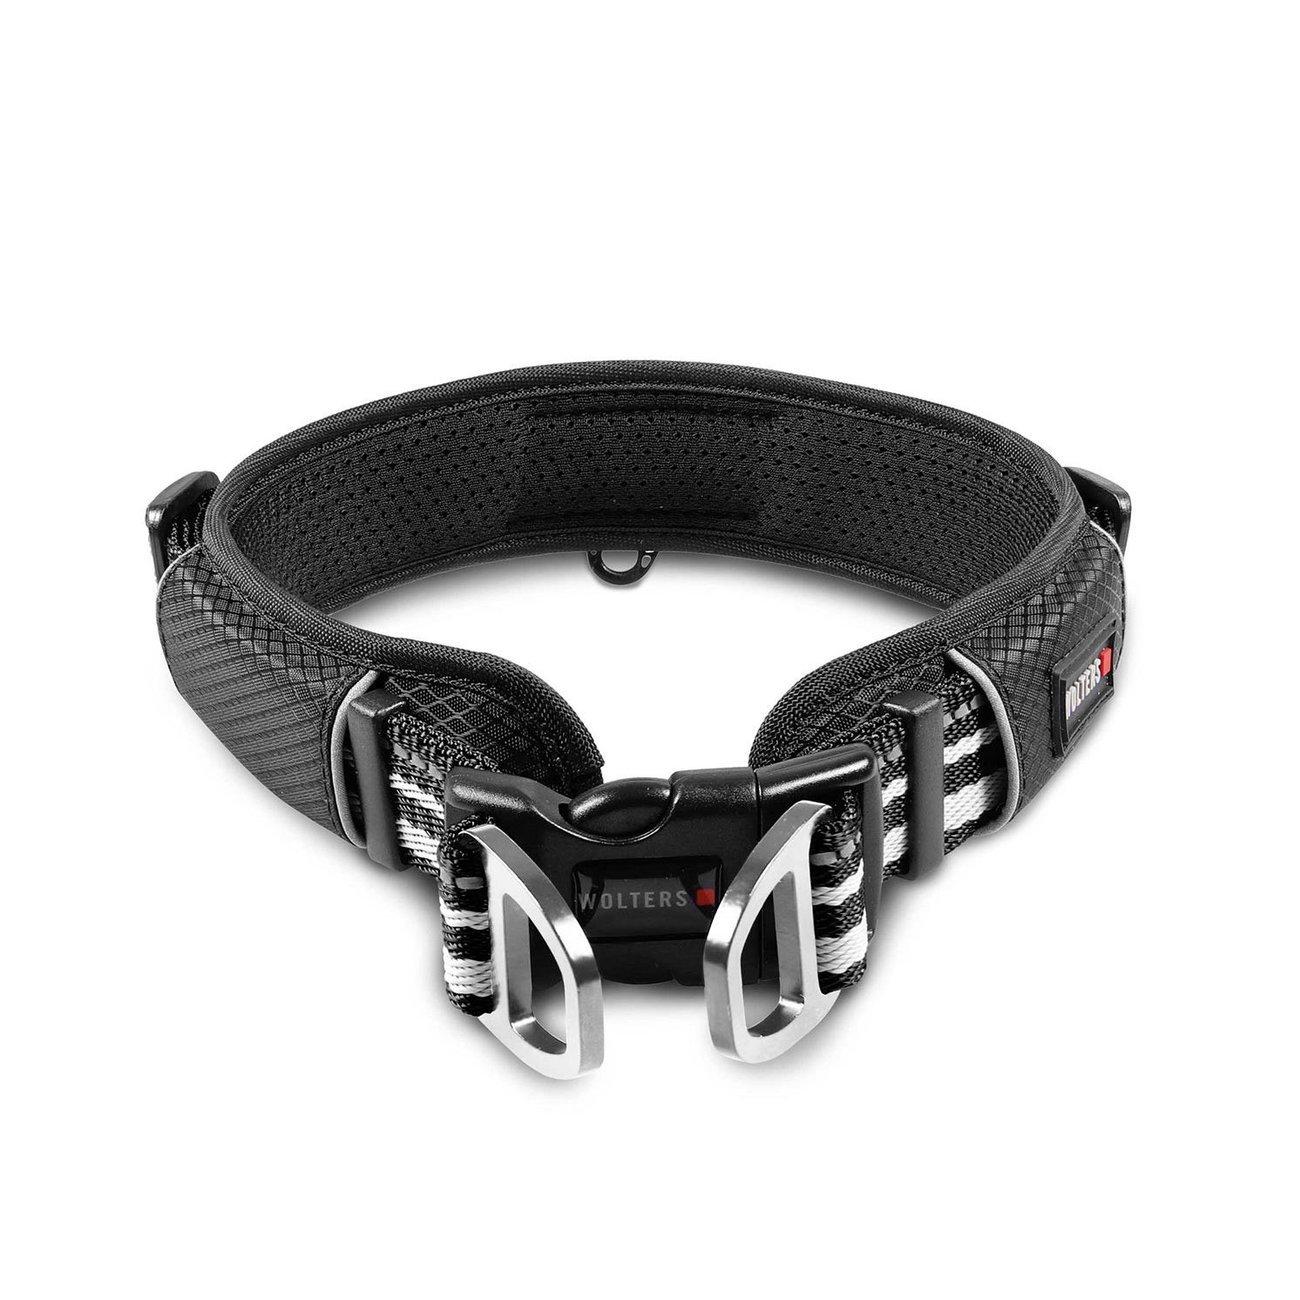 Wolters Hundehalsband Active Pro, Bild 3